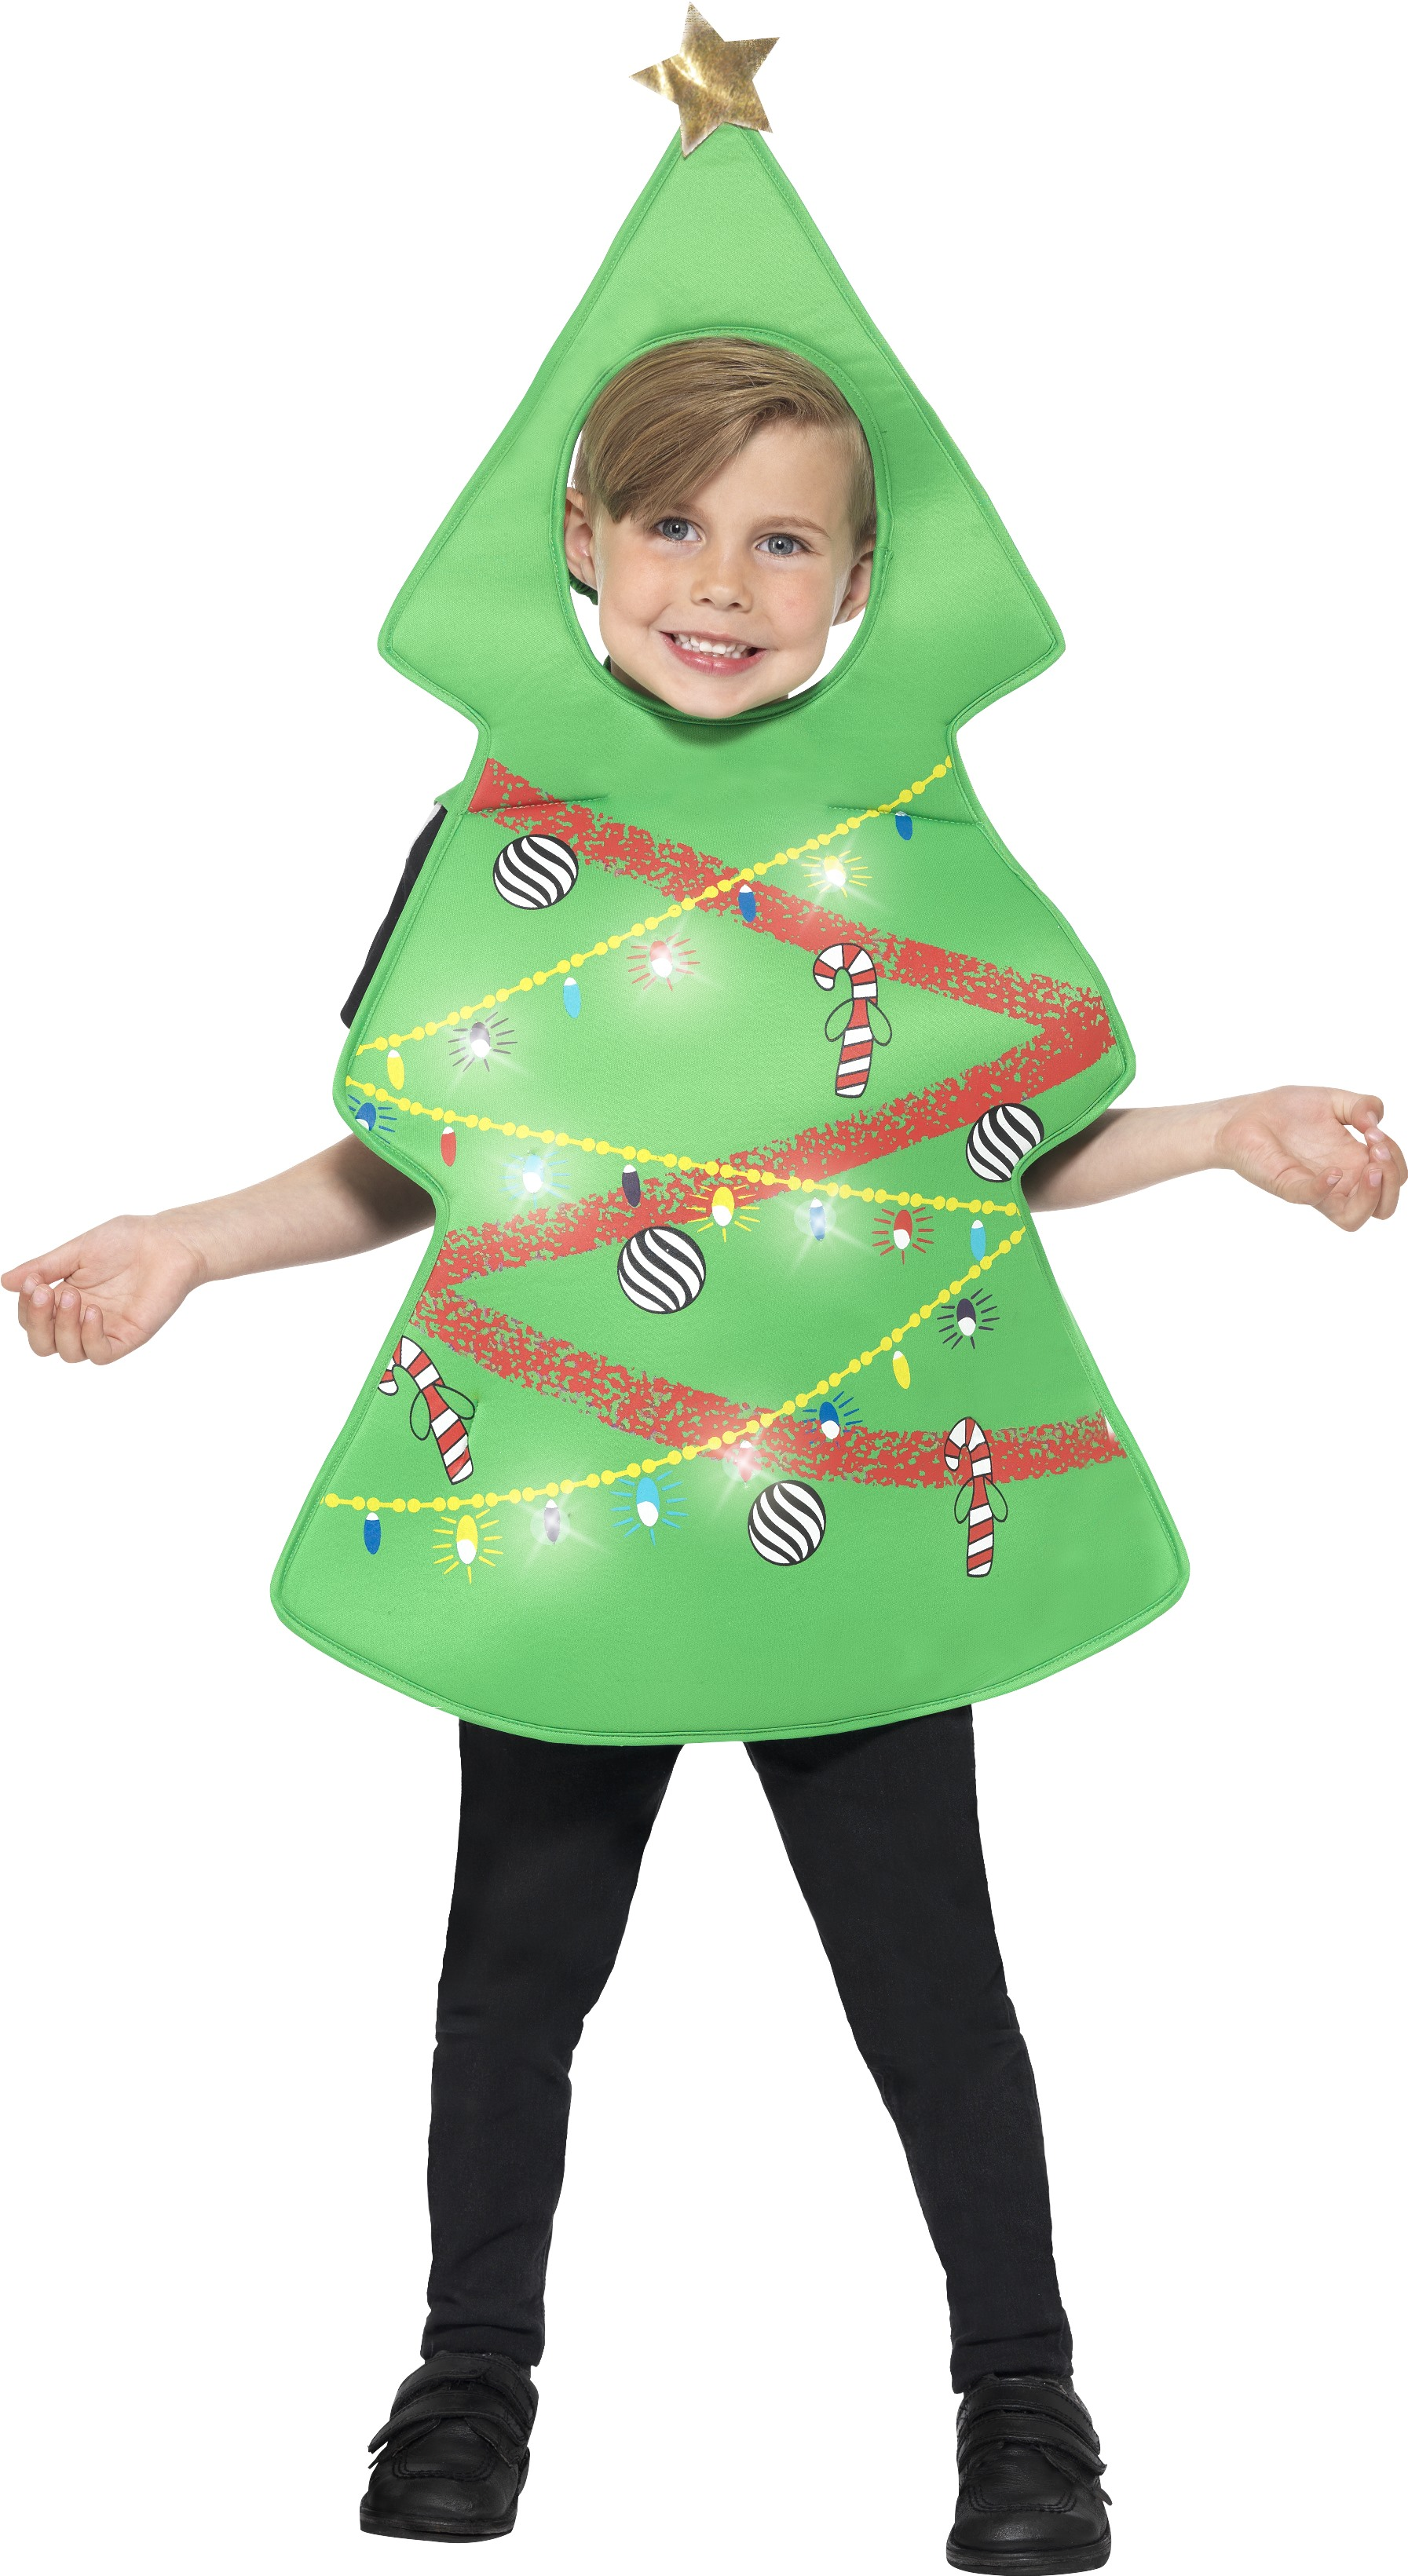 Christmas Tree Kids Fancy Dress Novelty Festive Fun Boys Girls Xmas Costume All Boy S Costumes Budget Fever